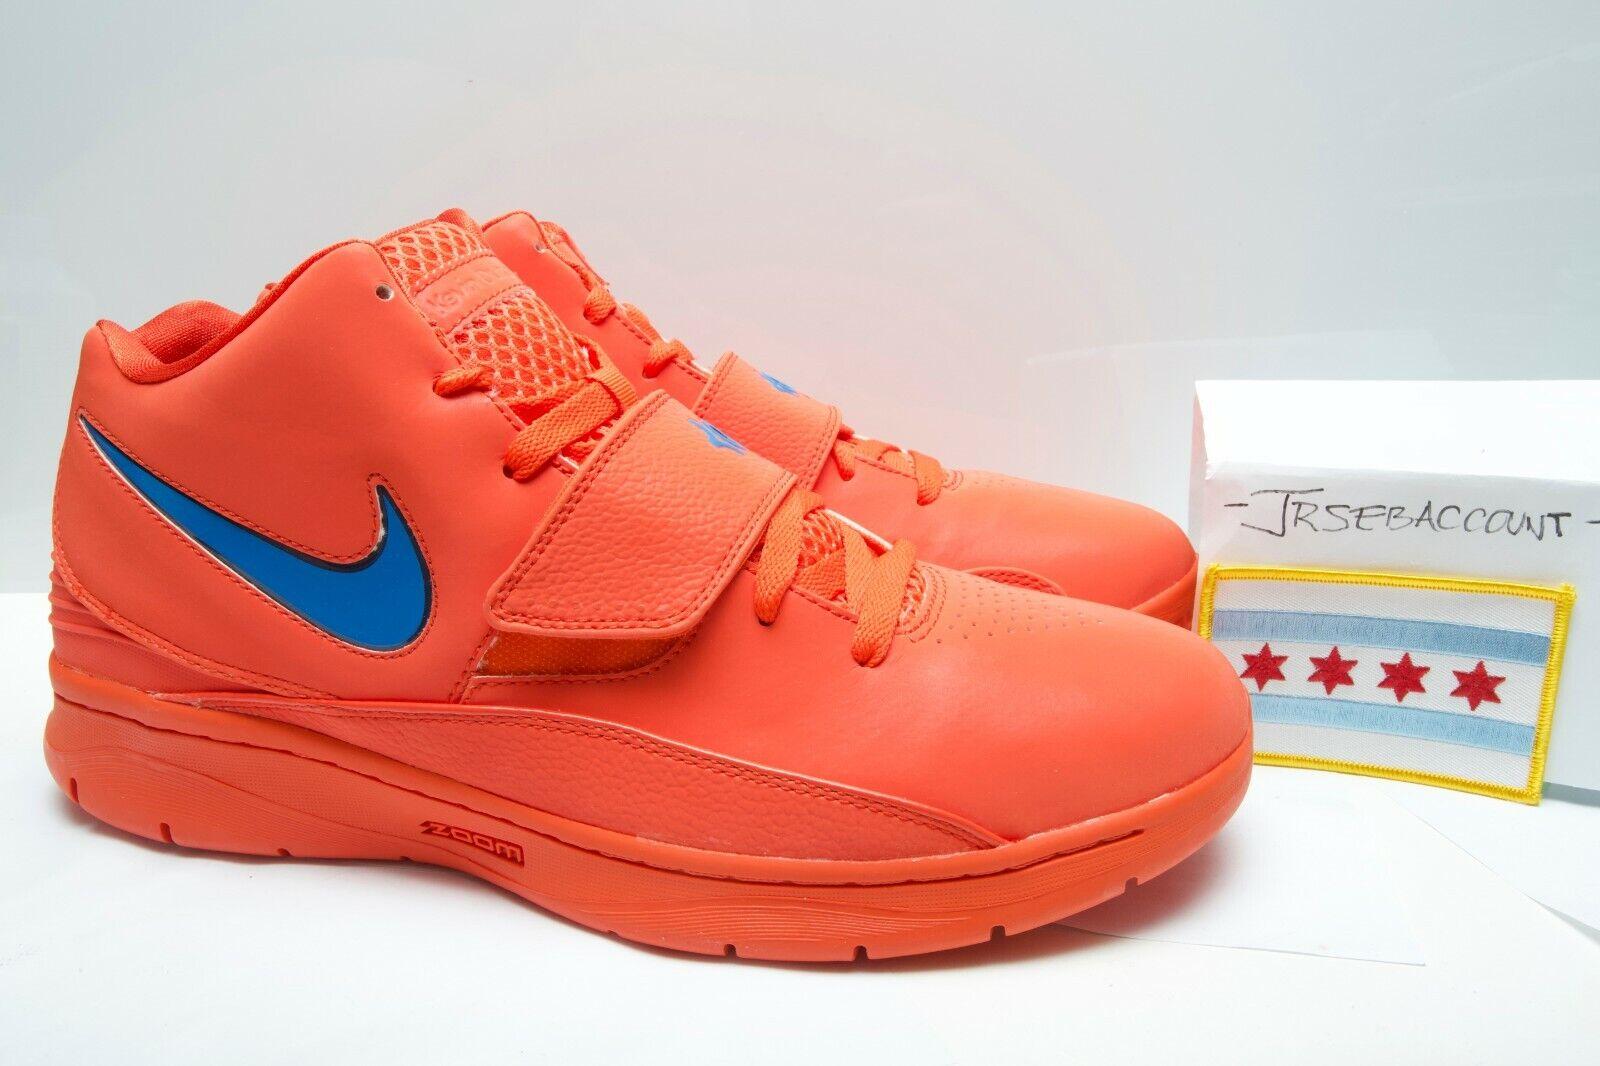 Nike Zoom KD II 2 Supreme - Creamsicle - Size 11 - 398262-800